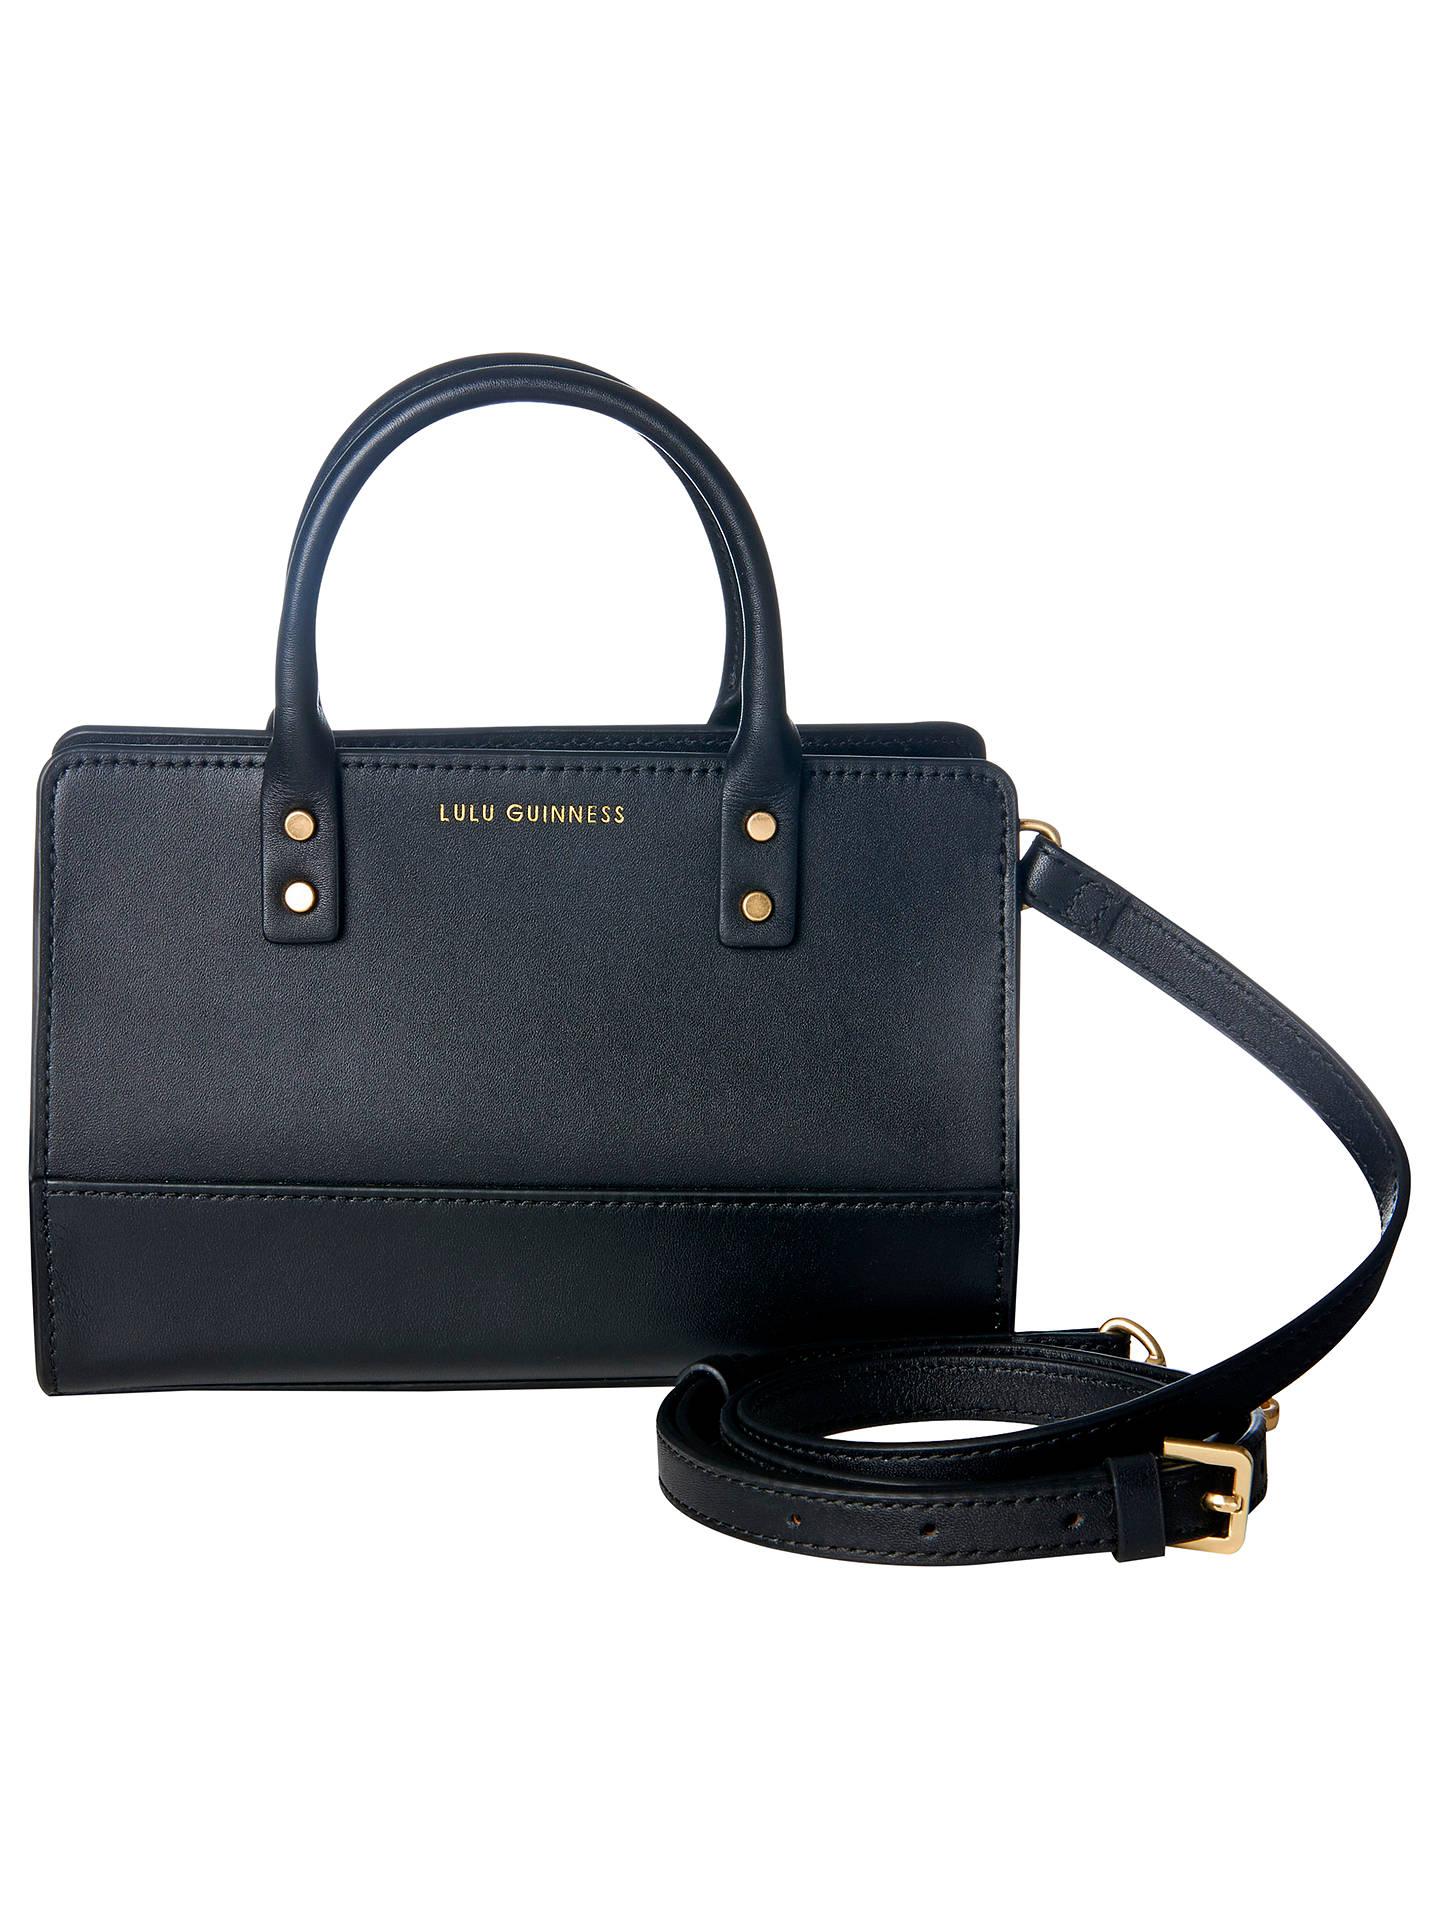 7b0df156a08d Buy Lulu Guinness Daphne Smooth Leather Mini Cross Body Bag